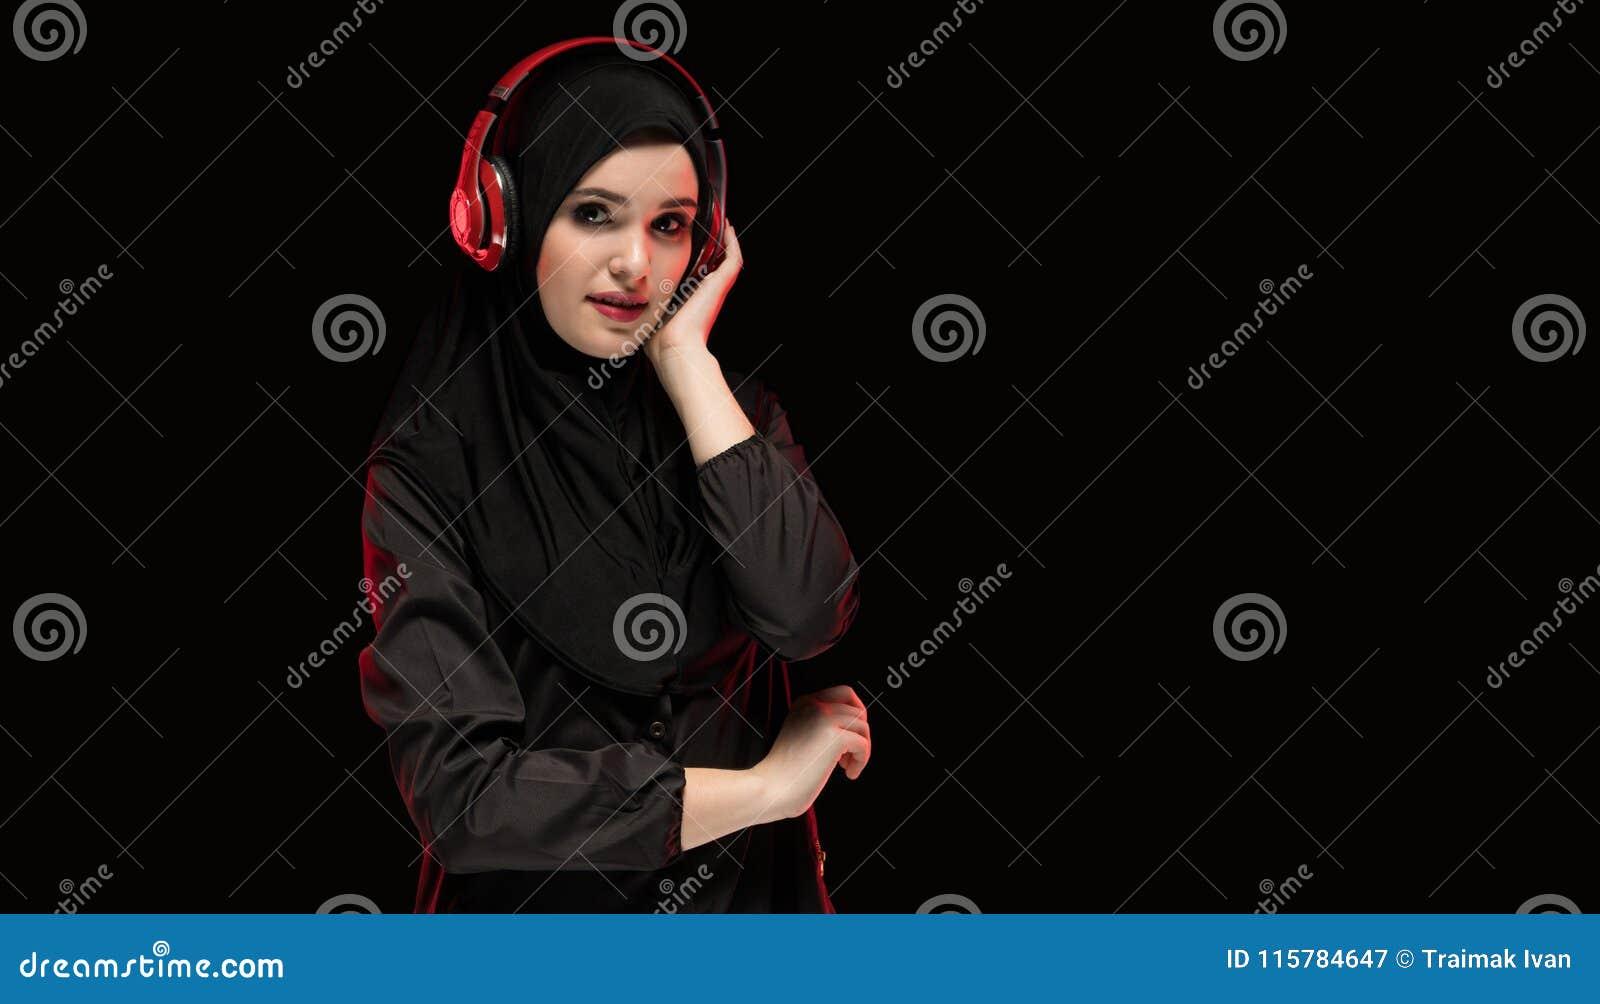 MUSIC HAJIB TÉLÉCHARGER